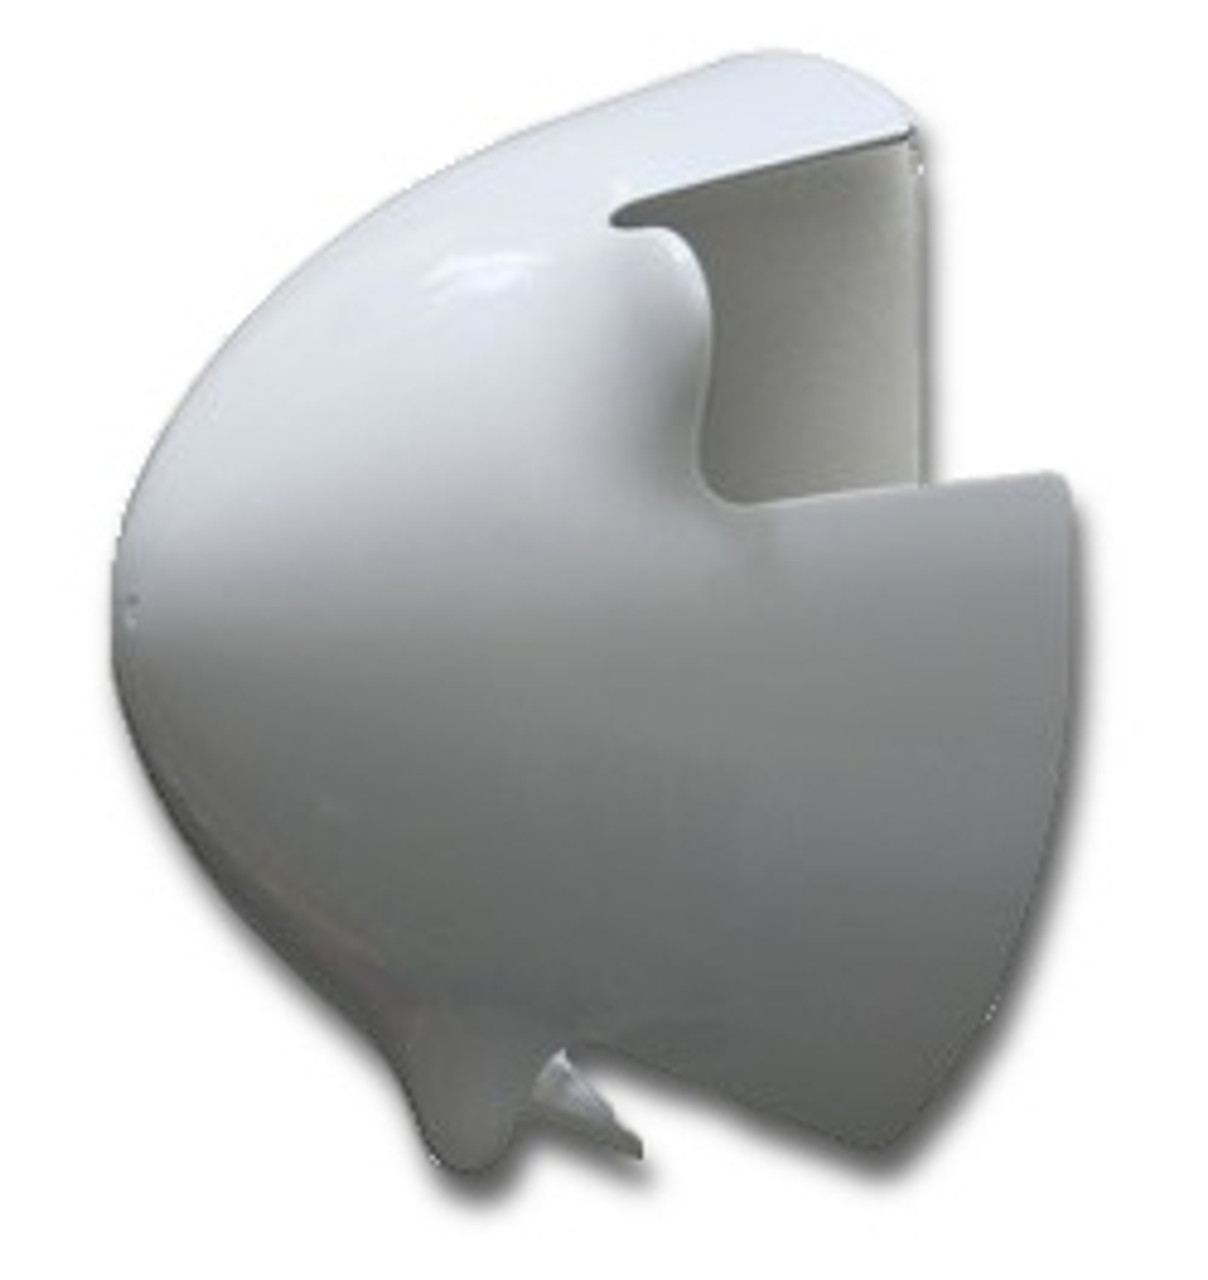 Replacement Nose Cone for MarineKinetix MK450/MK4+